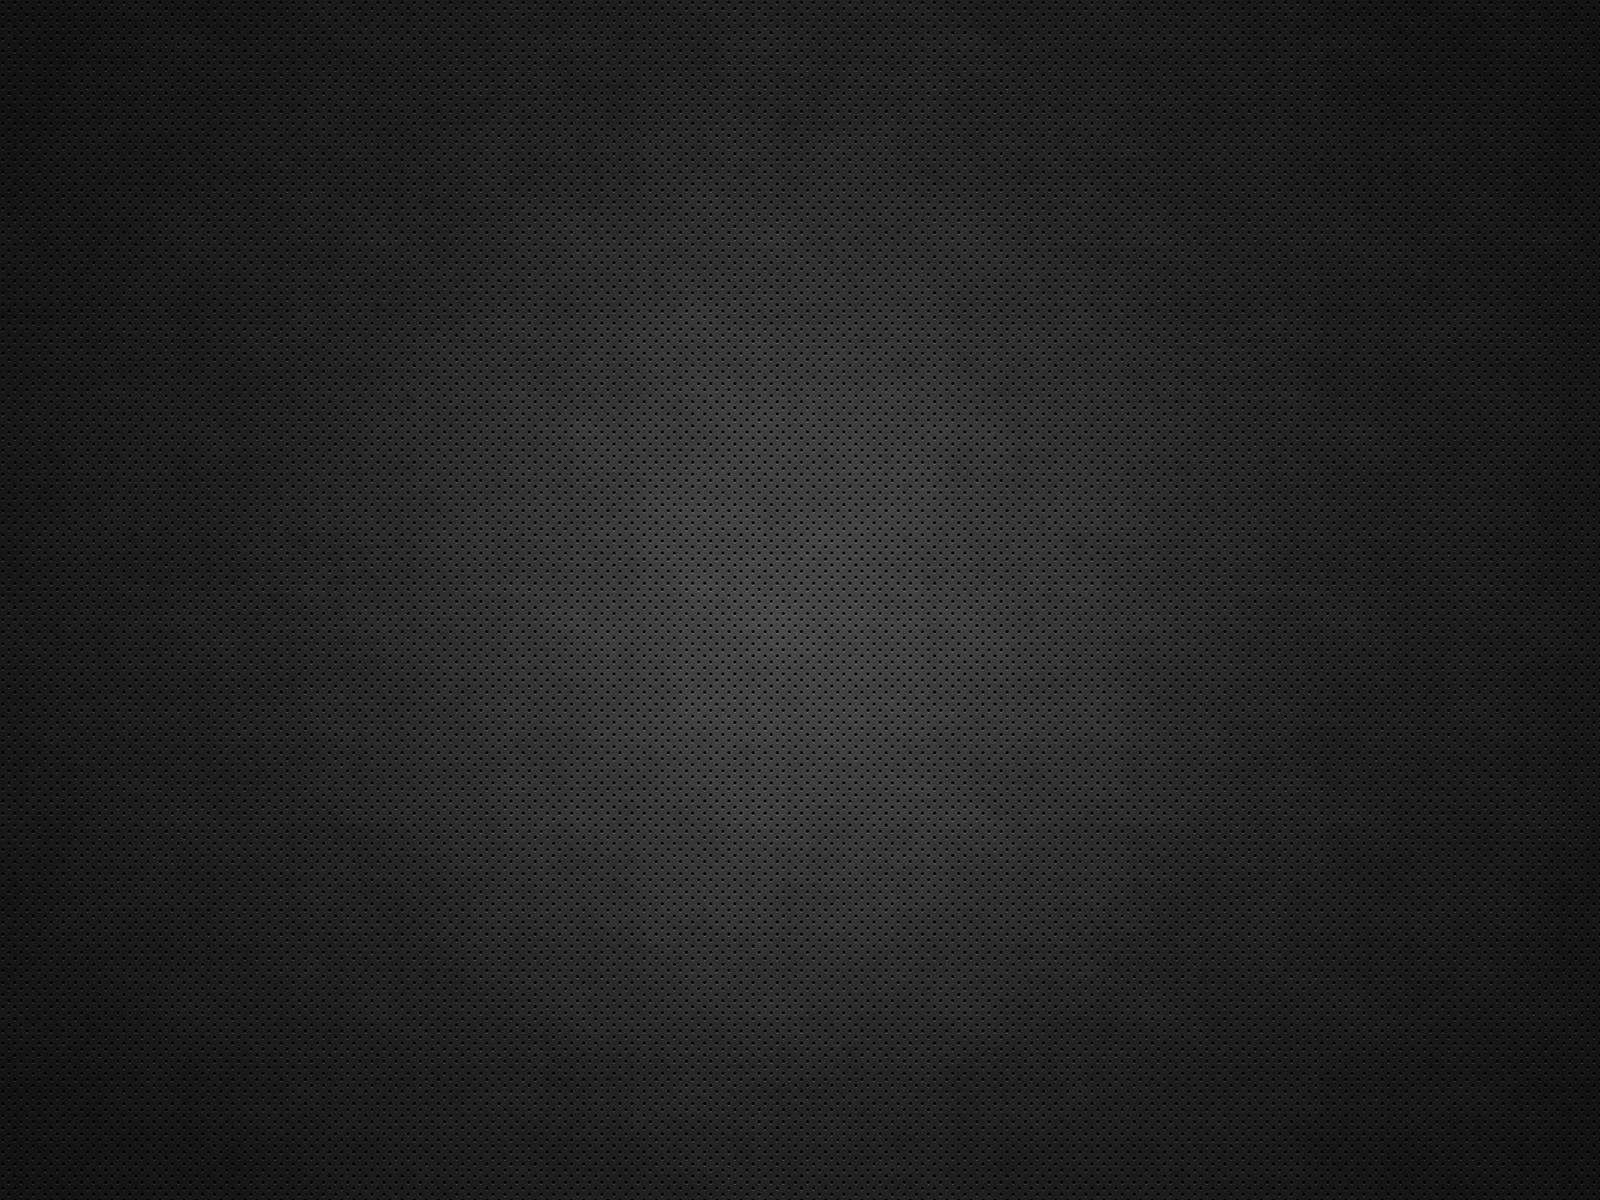 PerferatedBlack2.jpg